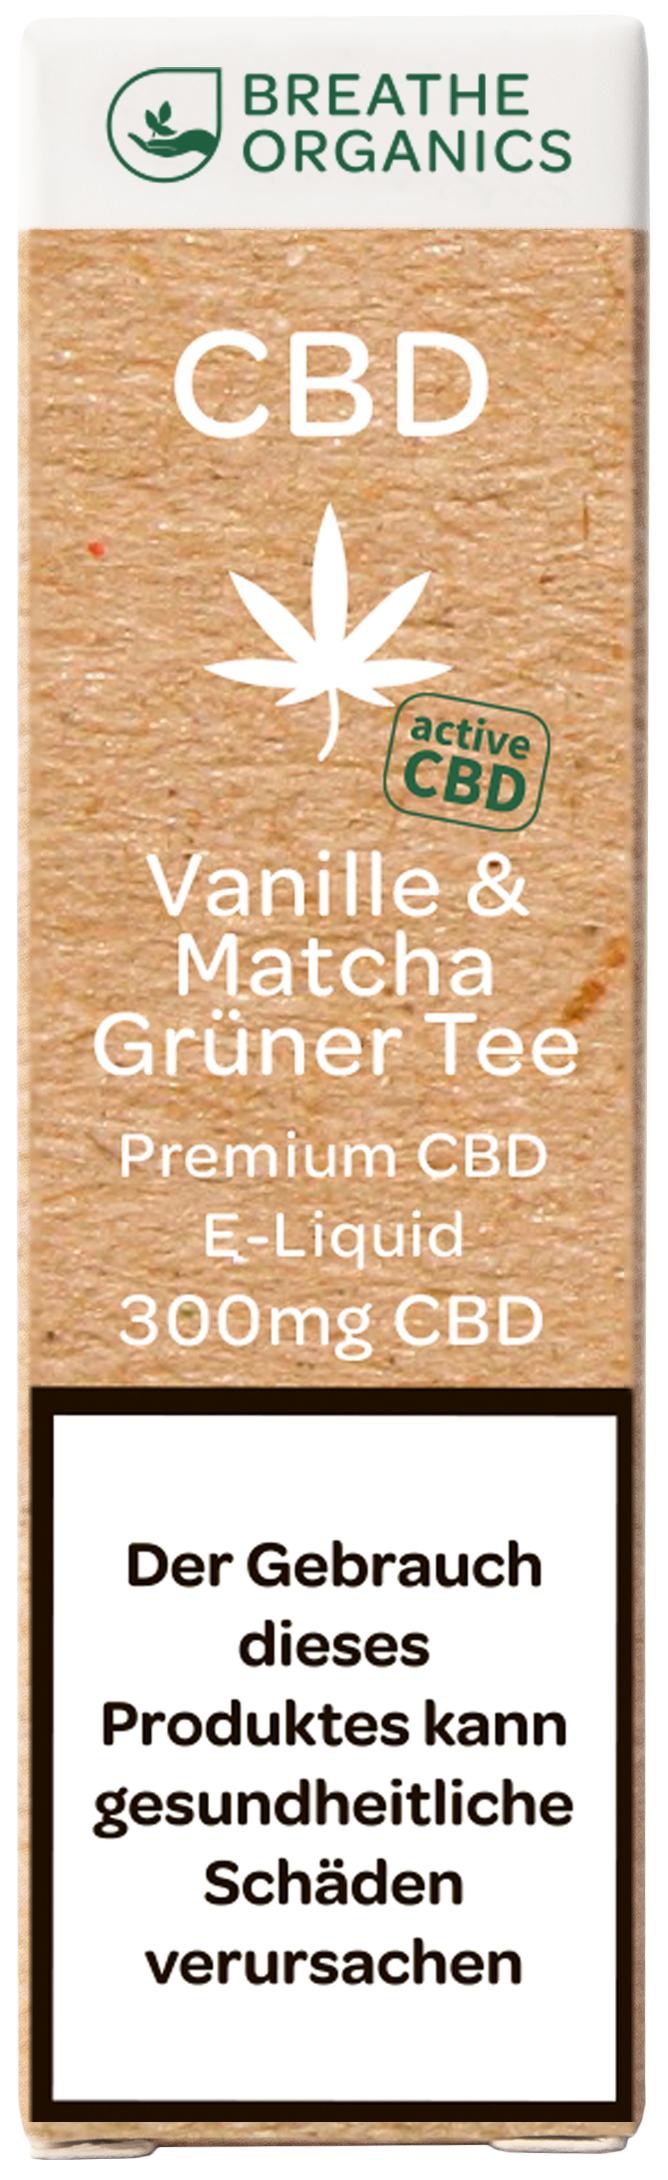 Breathe Organics CBD Liquid Vanille & Matcha 300mg